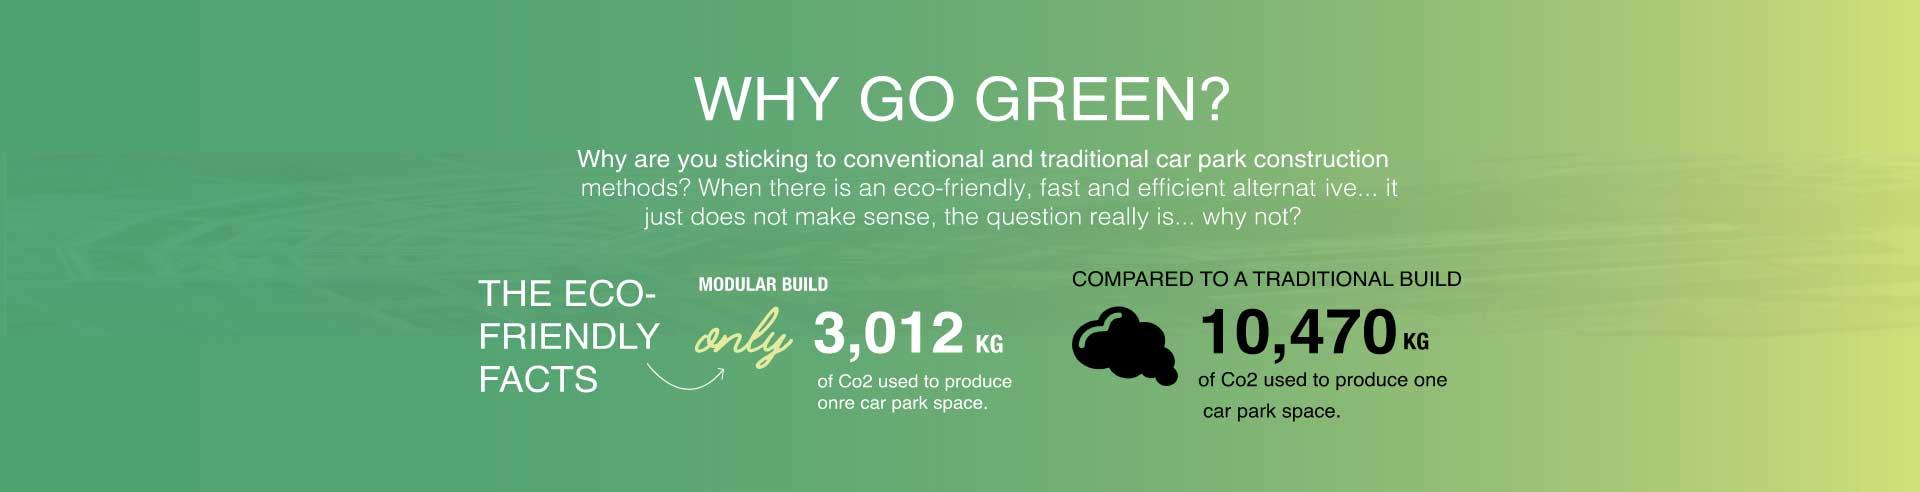 green environement parking construction